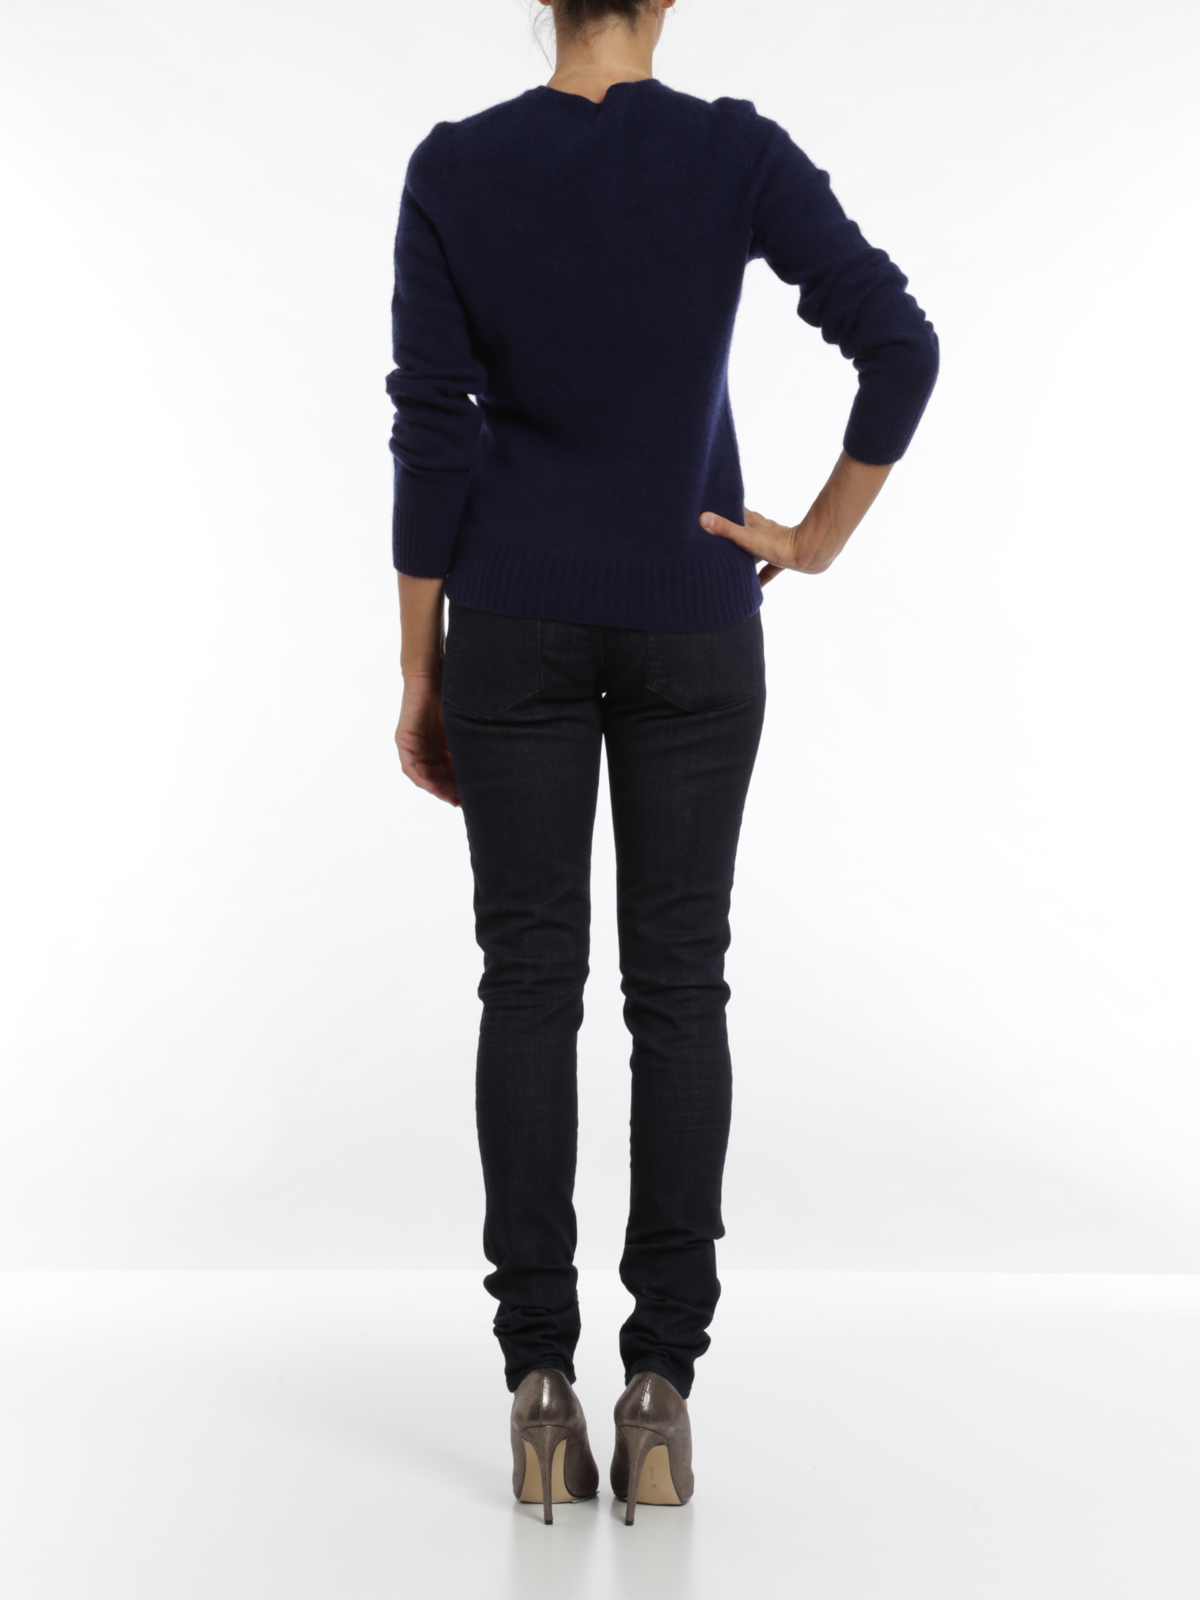 Ralph Ig287 V60 Lauren Jeans Tomkins Polo Skinny 6fYgyb7v